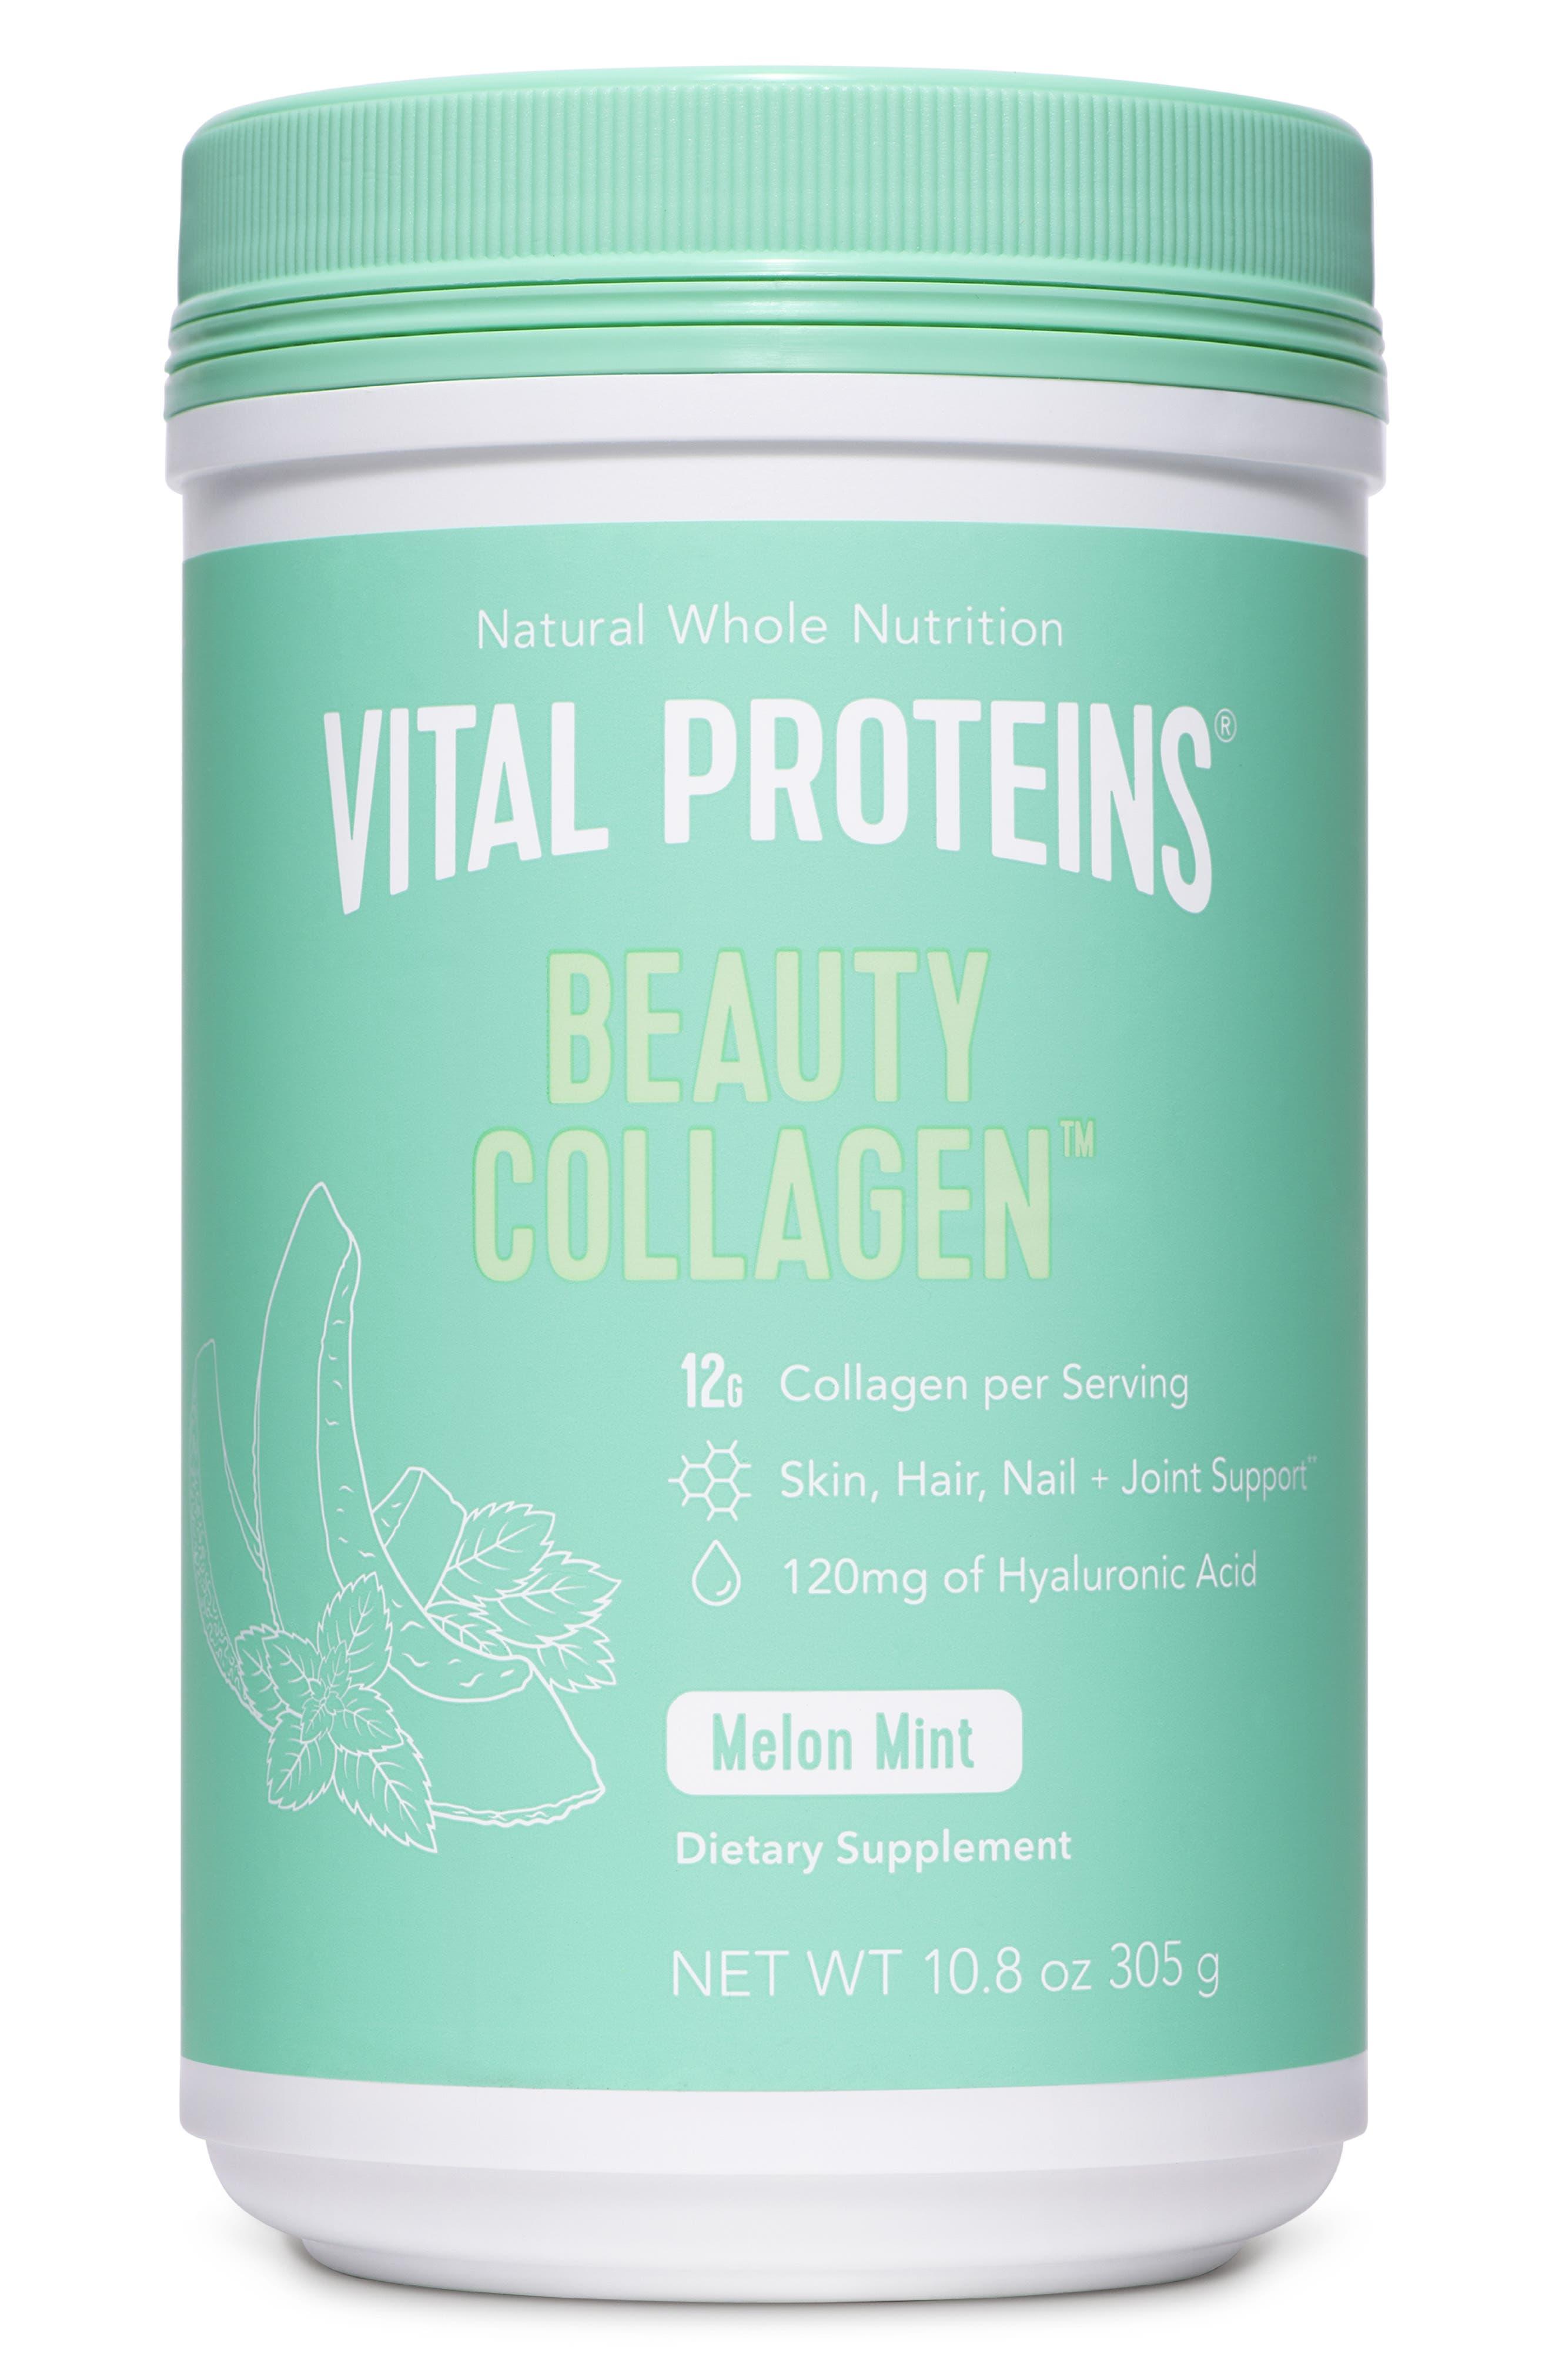 VITAL PROTEINS Beauty Collagen Dietary Supplement, Main, color, MELON MINT